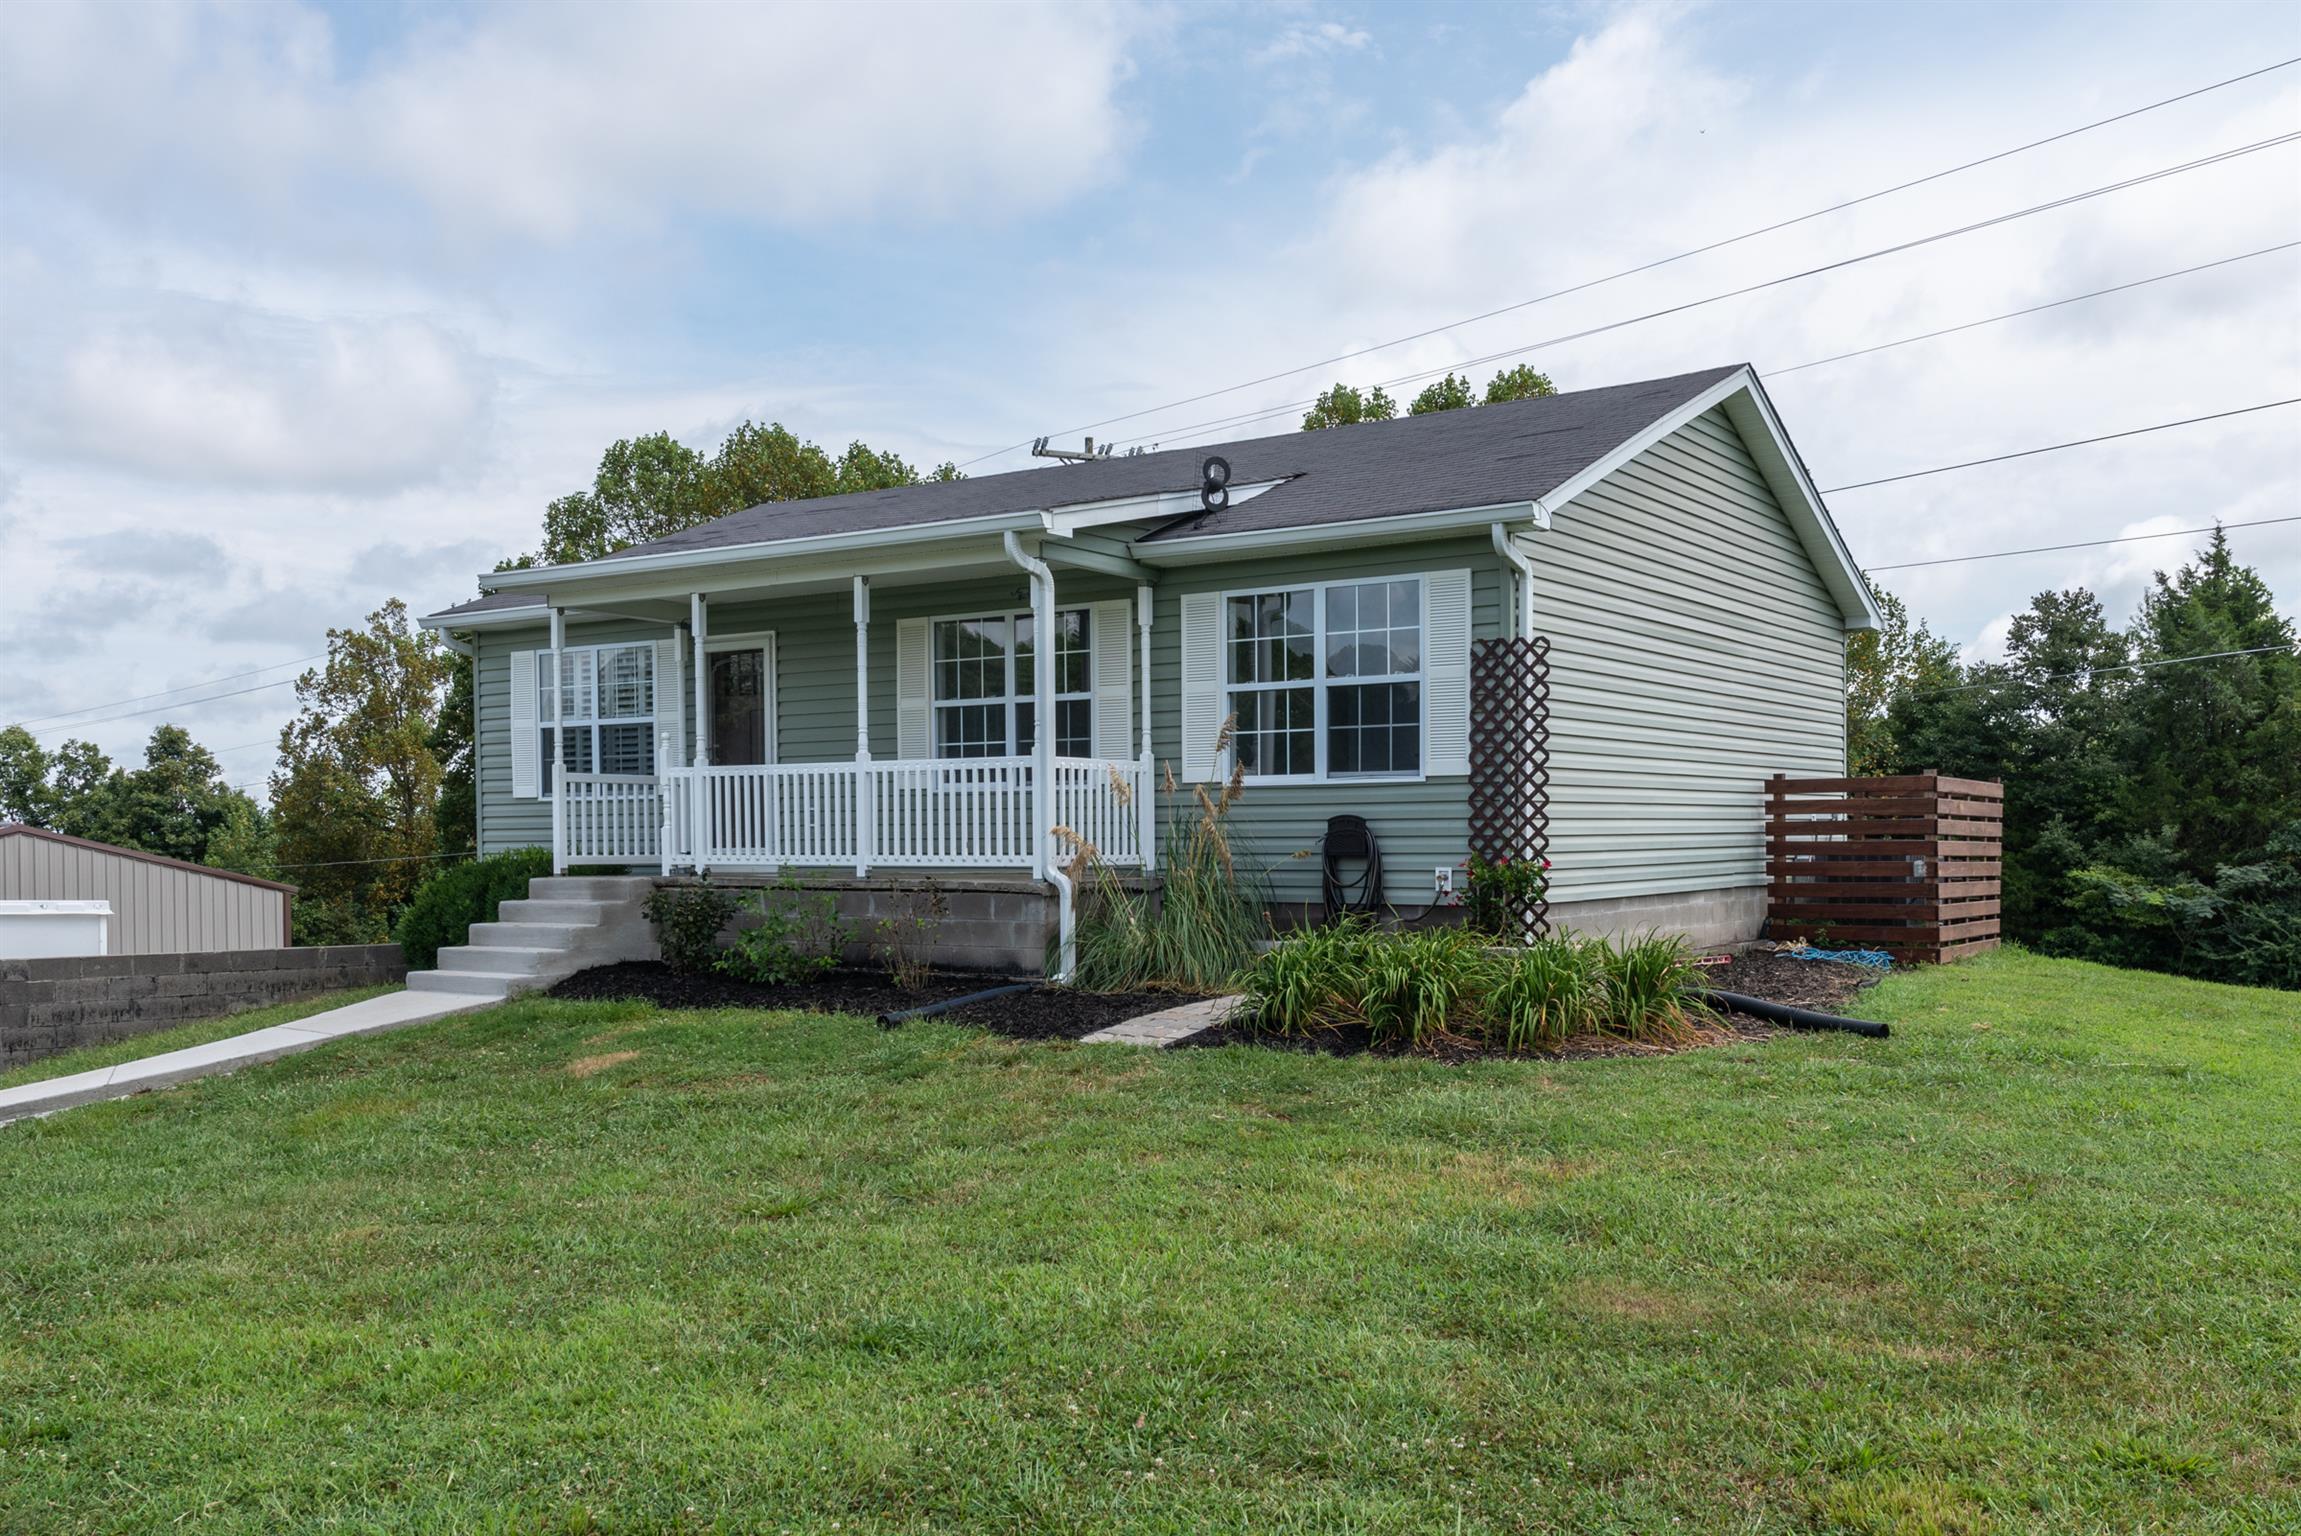 149 New Douglas Loop Rd, Gallatin, TN 37066 - Gallatin, TN real estate listing